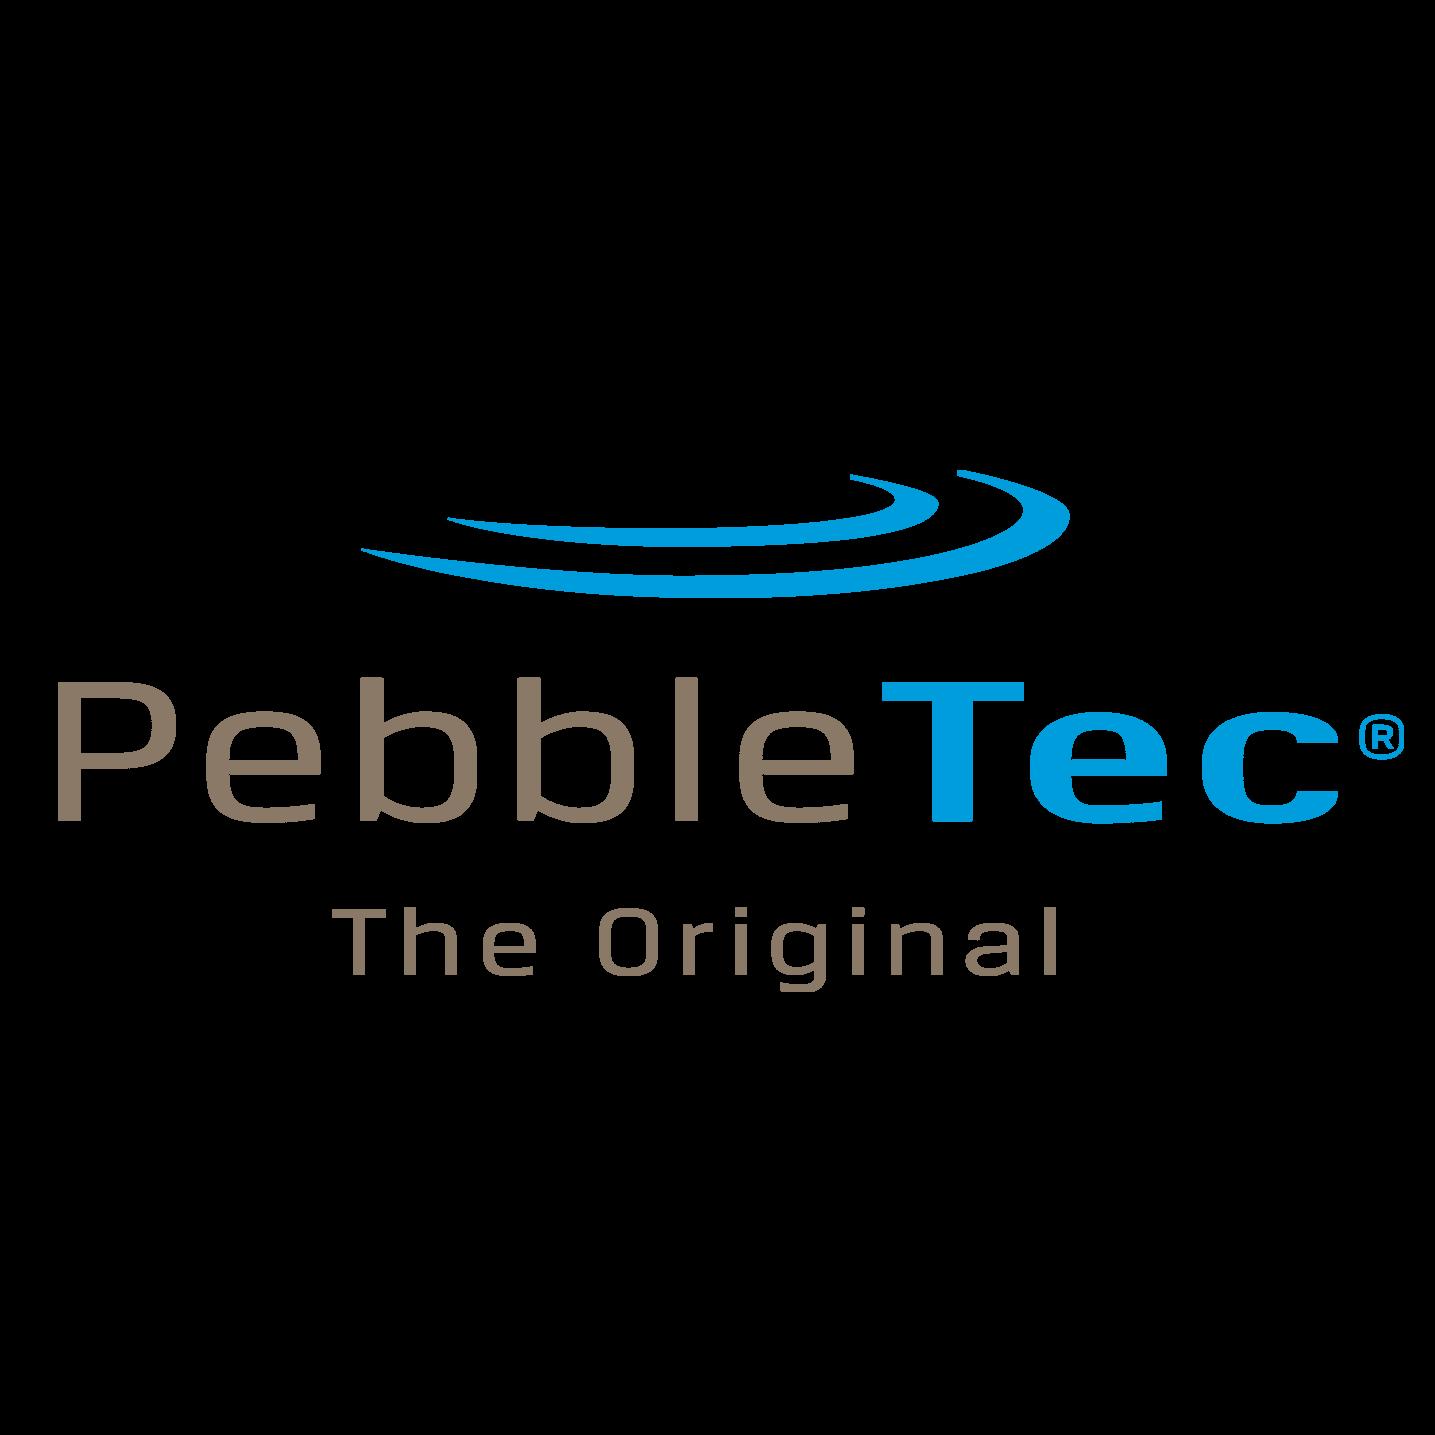 https://www.springpools.net/wp-content/uploads/2019/01/PebbleTec-logo-v3-copy.png